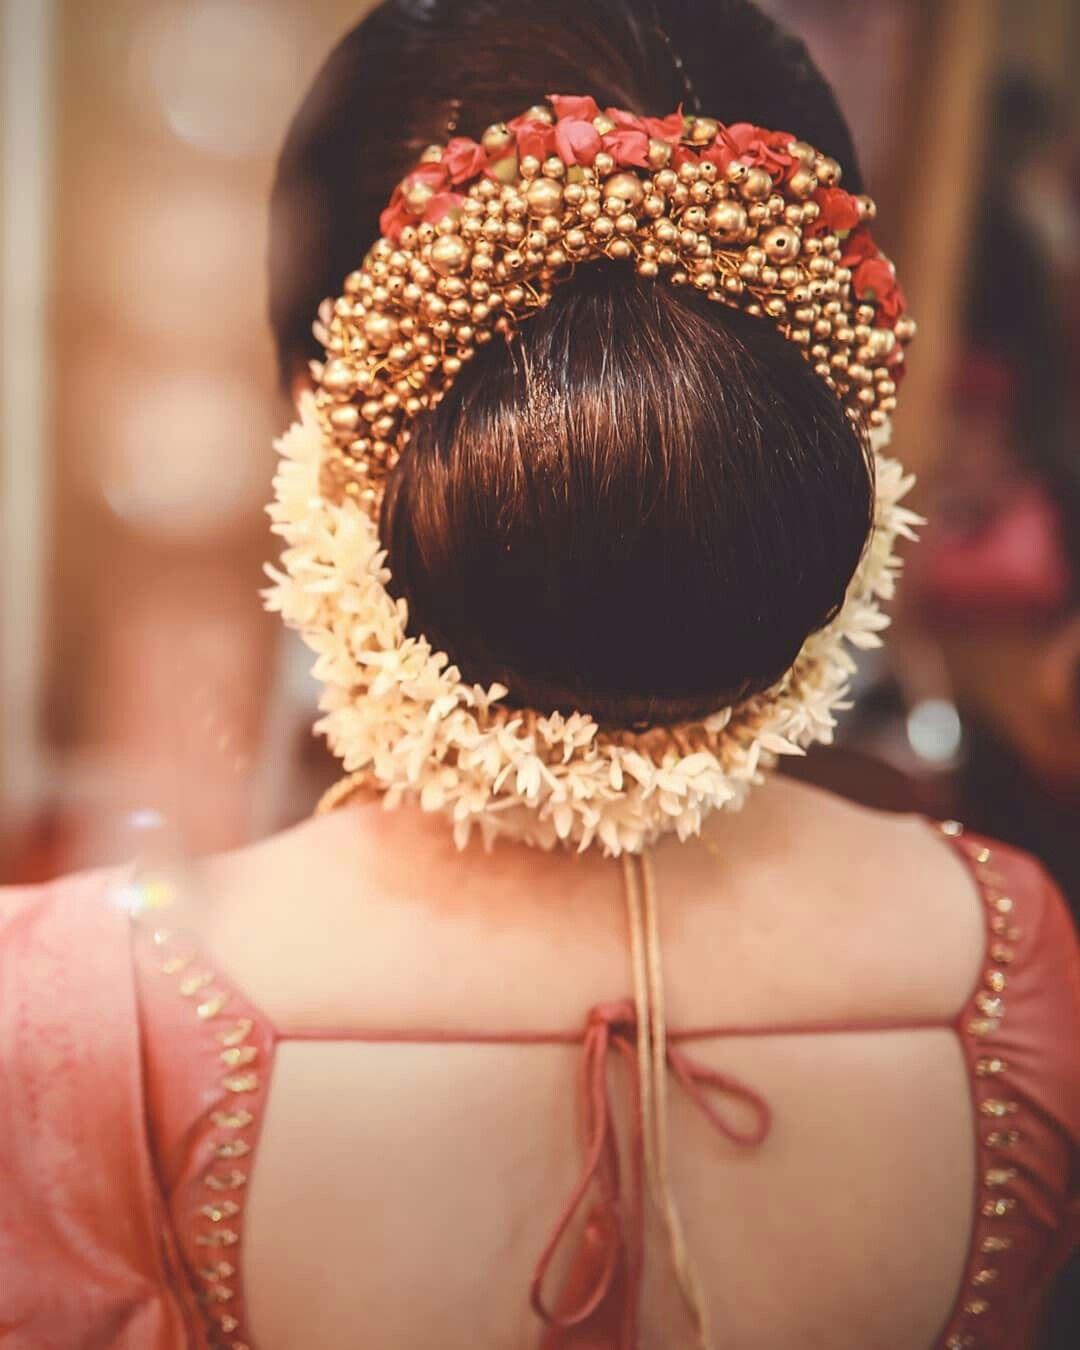 Pin By Latha Manju On Kerala Wedding Photography In 2020 Indian Bun Hairstyles South Indian Wedding Hairstyles Indian Wedding Hairstyles